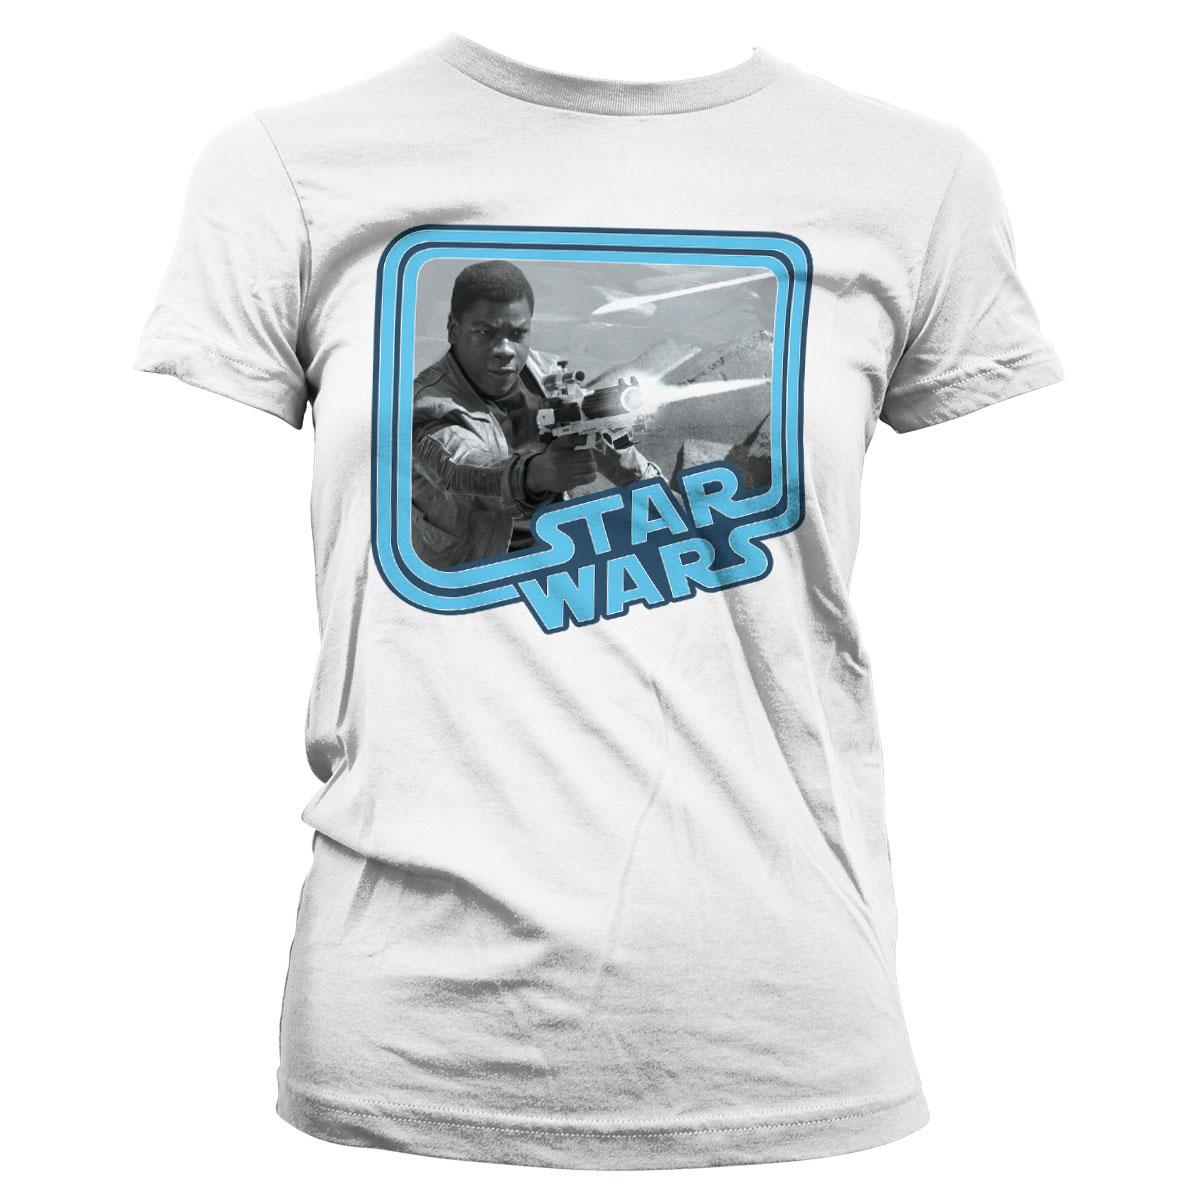 Star Wars 7 – Finn Girly Tee